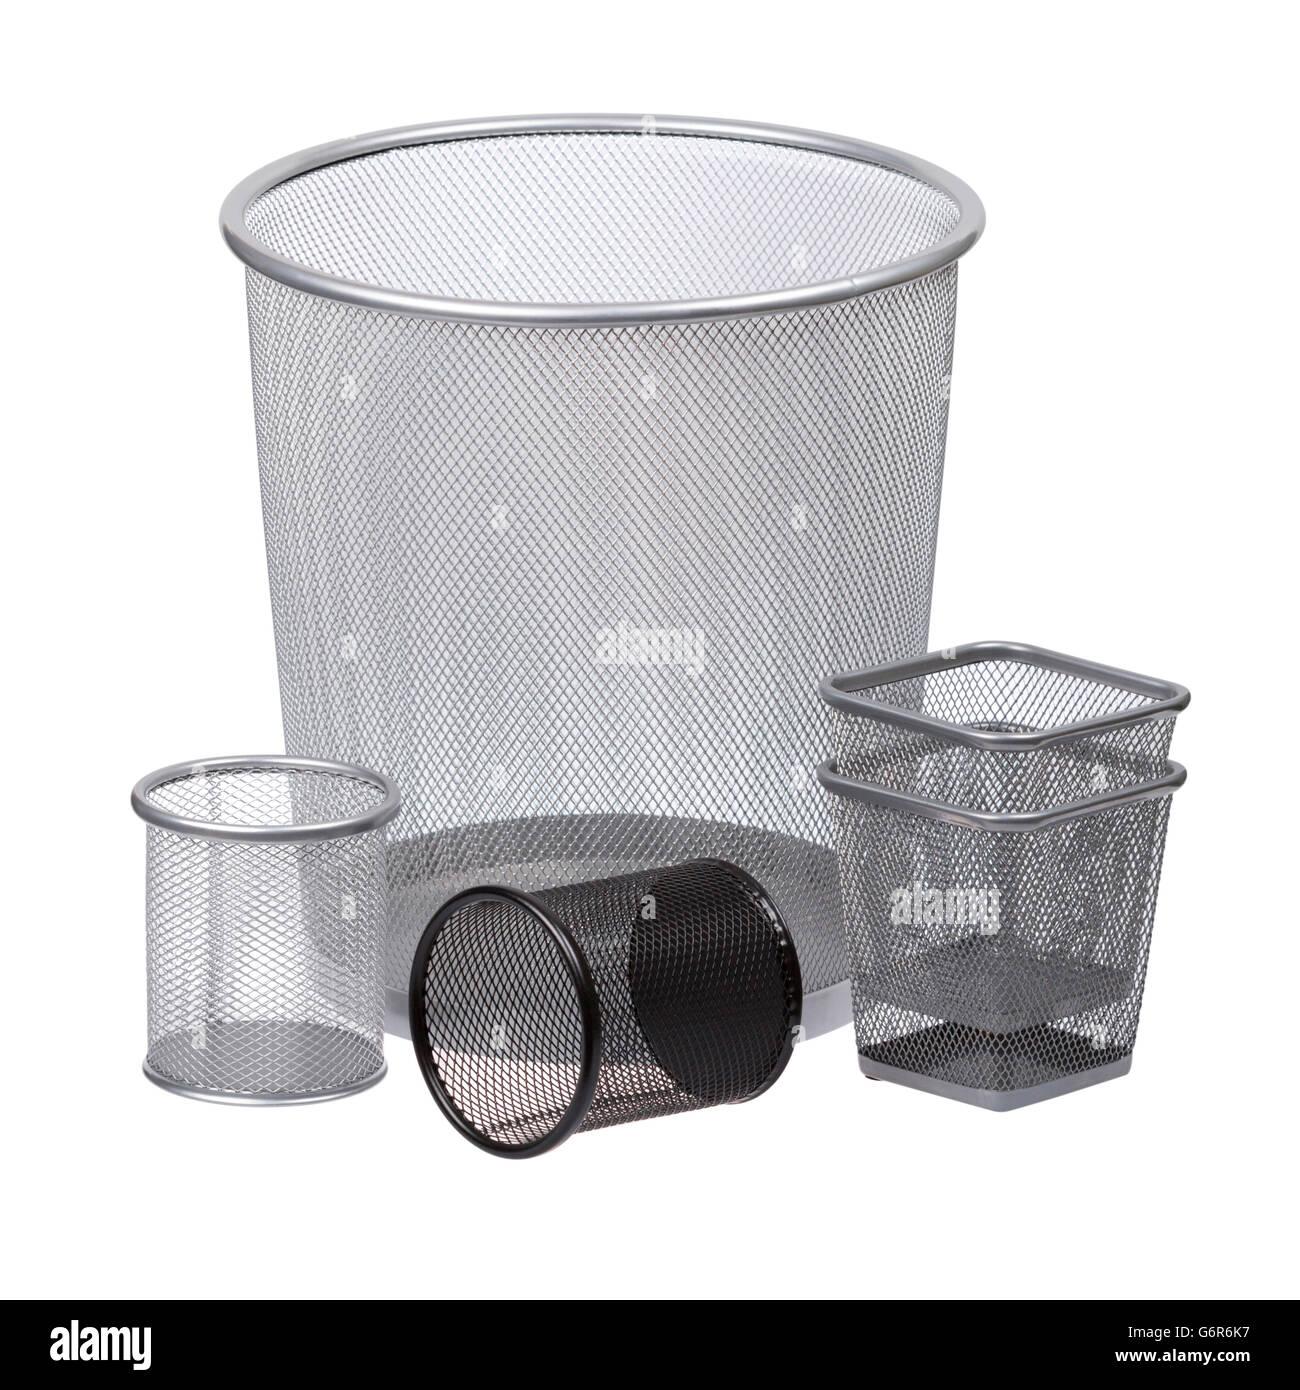 Multiple trash bins - Stock Image